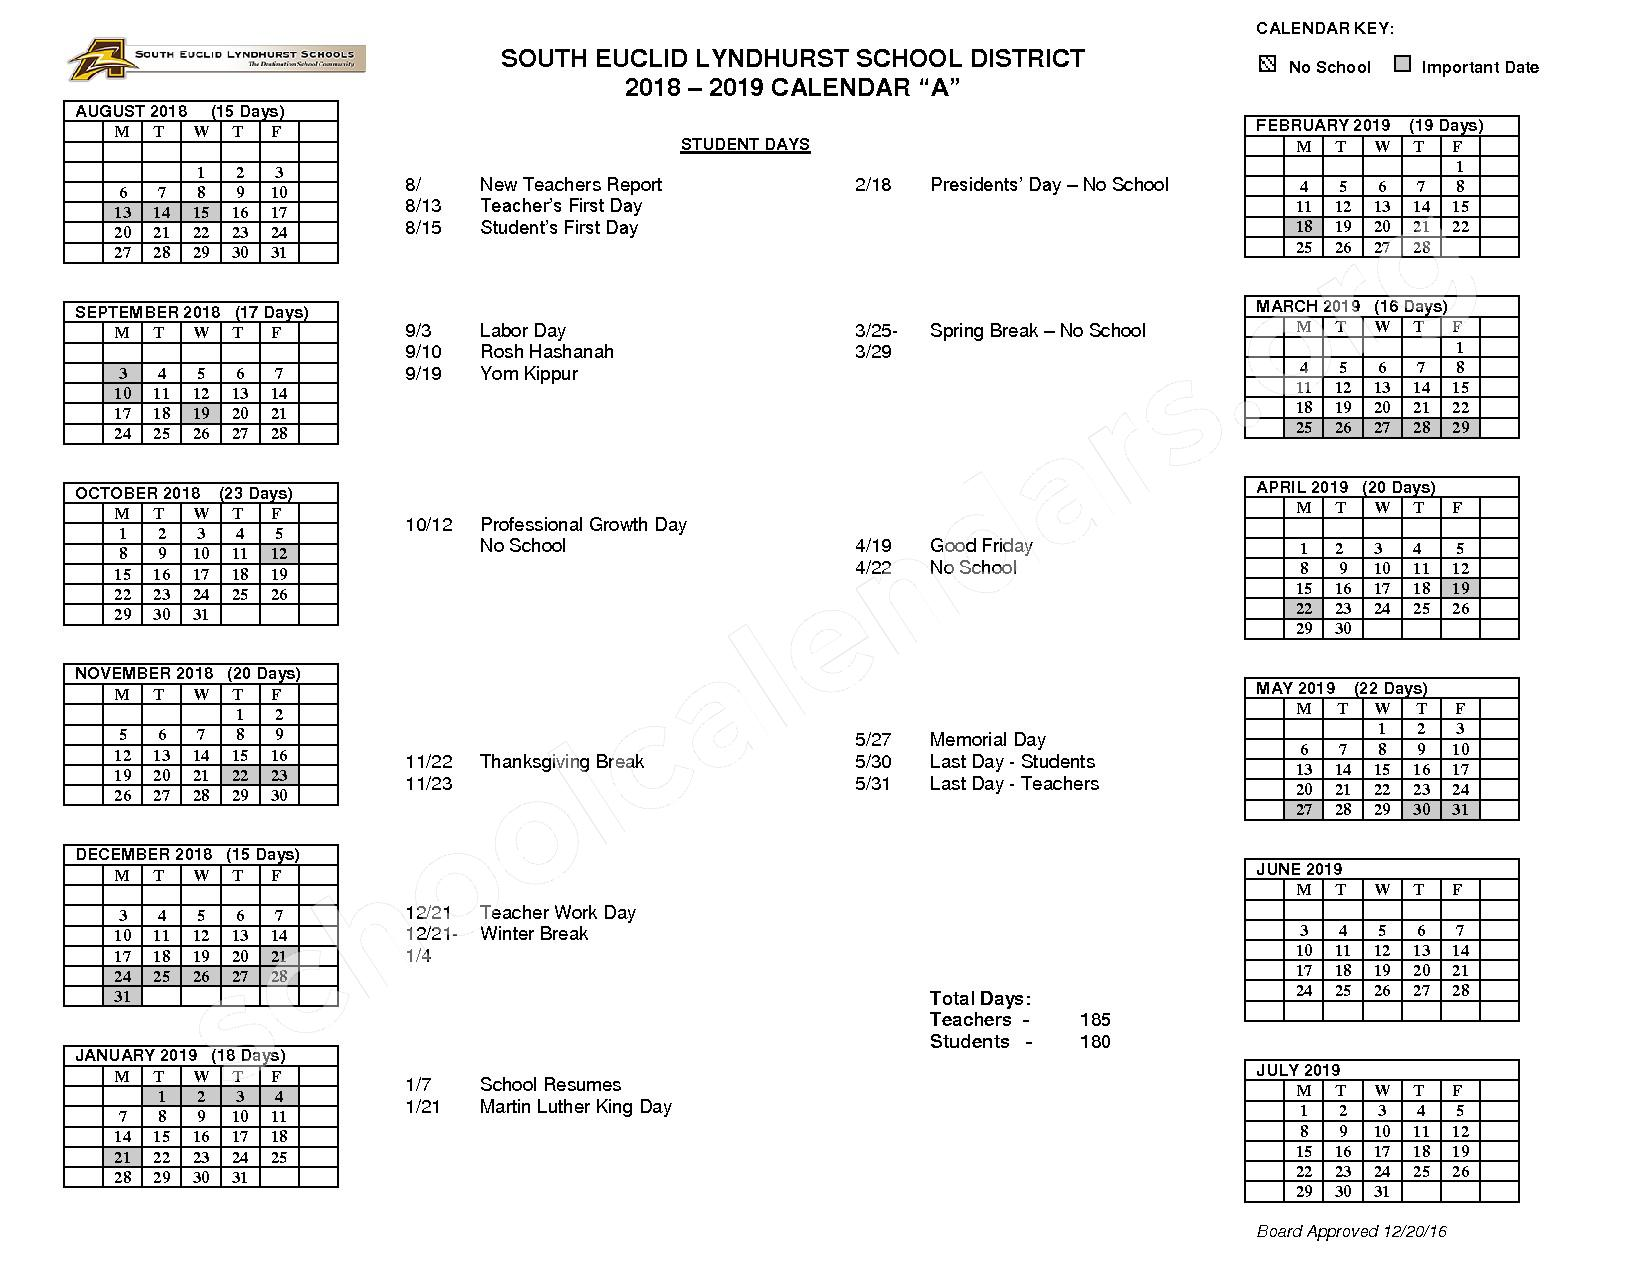 2018 - 2019 School Calendar – Greenview Upper Elementary School – page 1